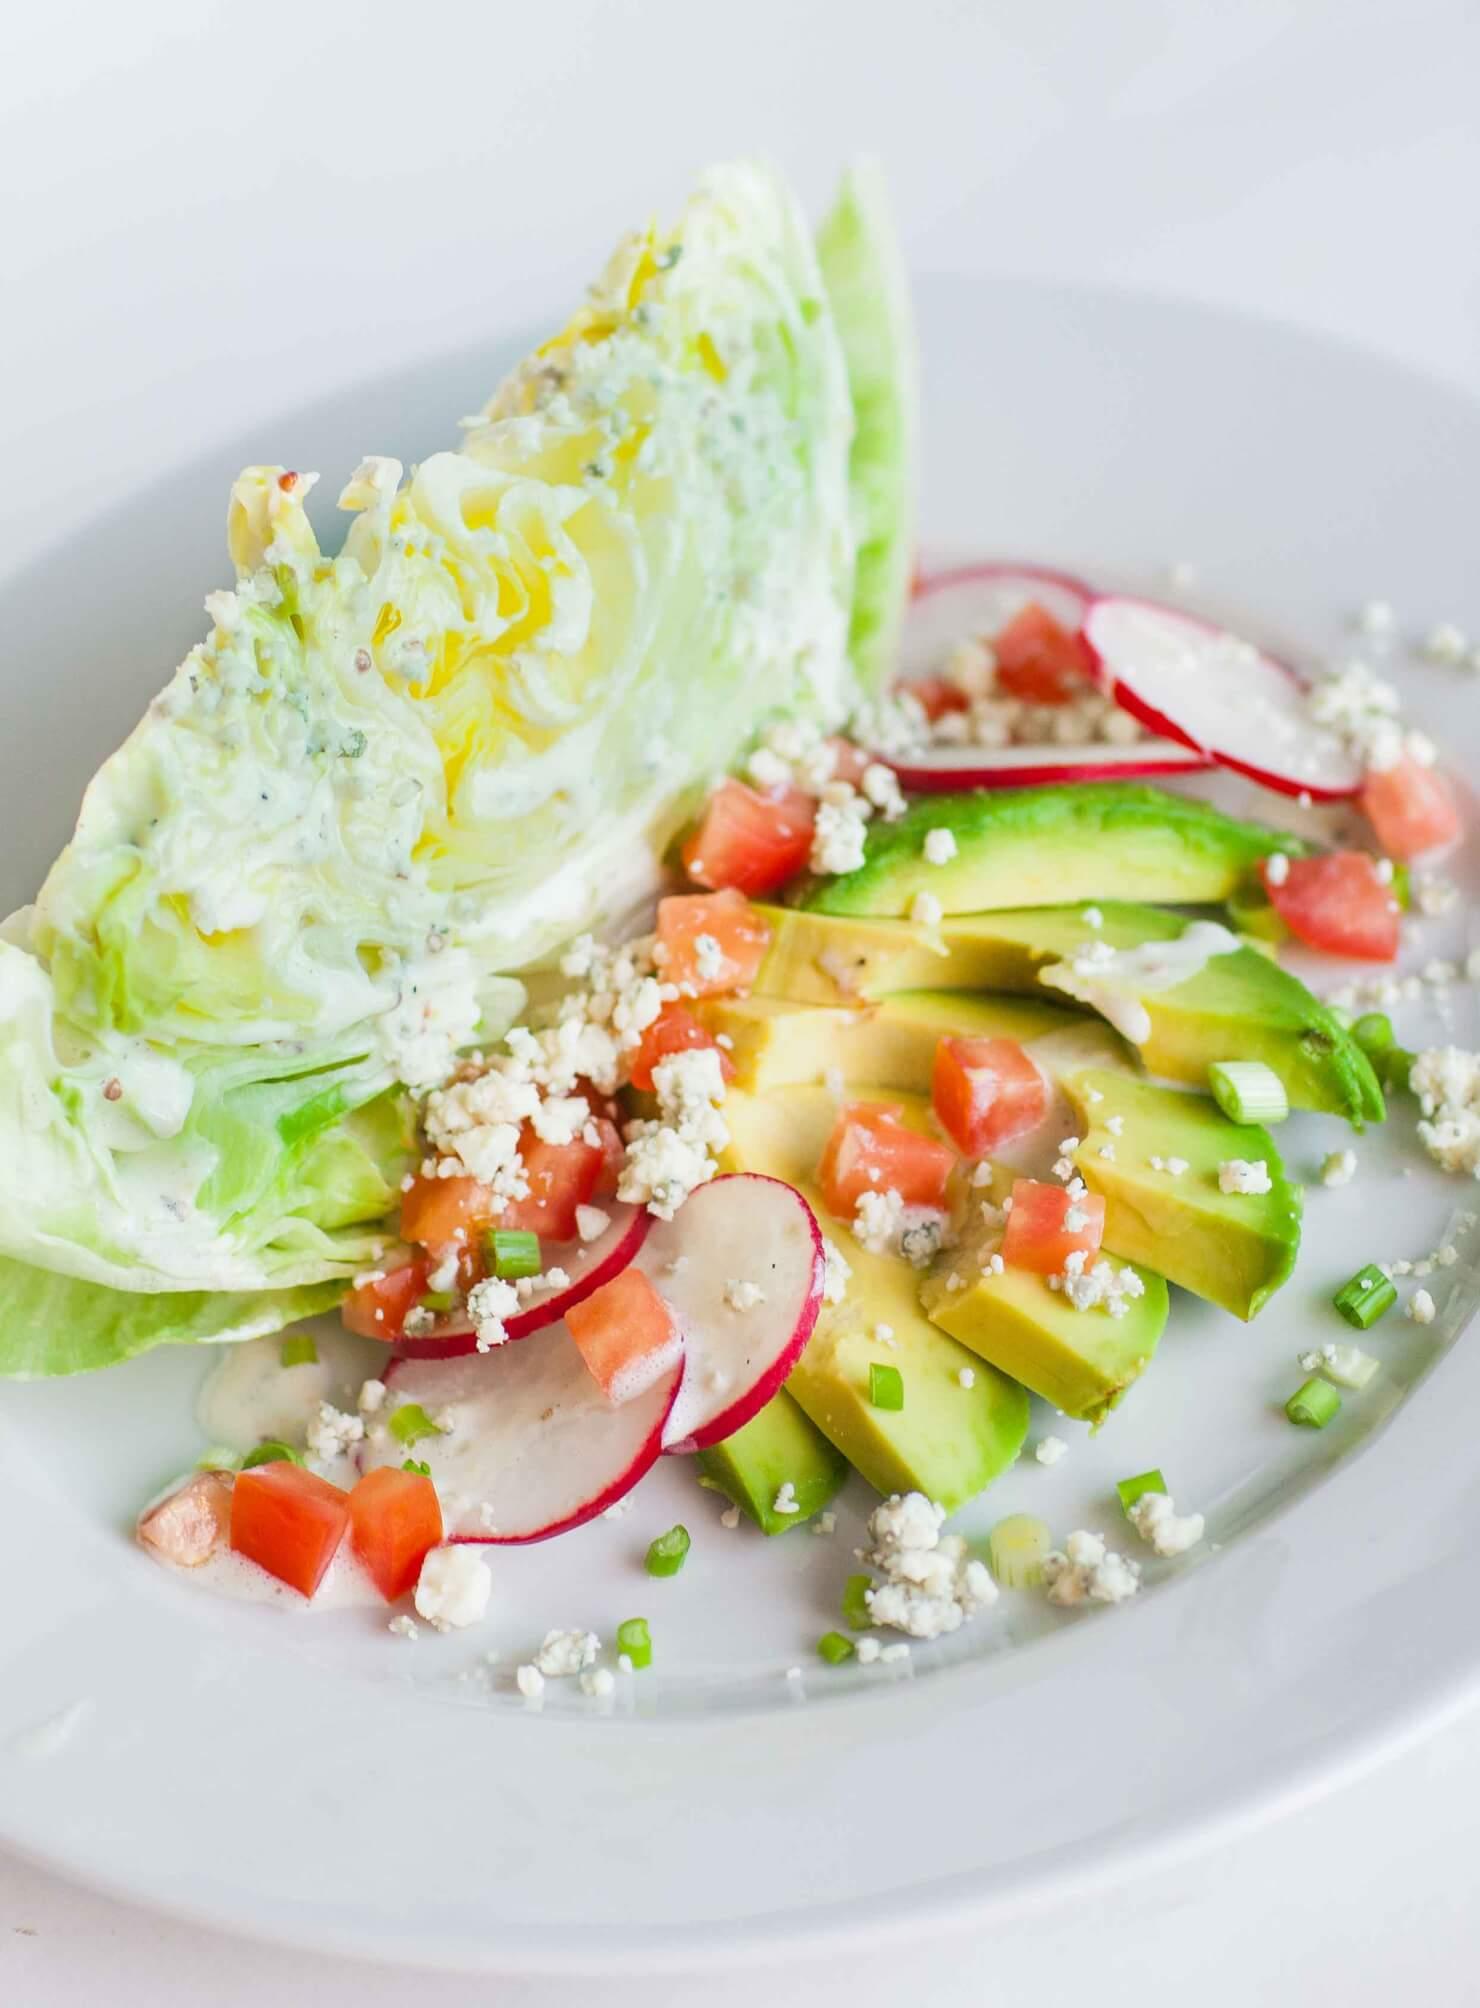 wedge salad with avocado and radish